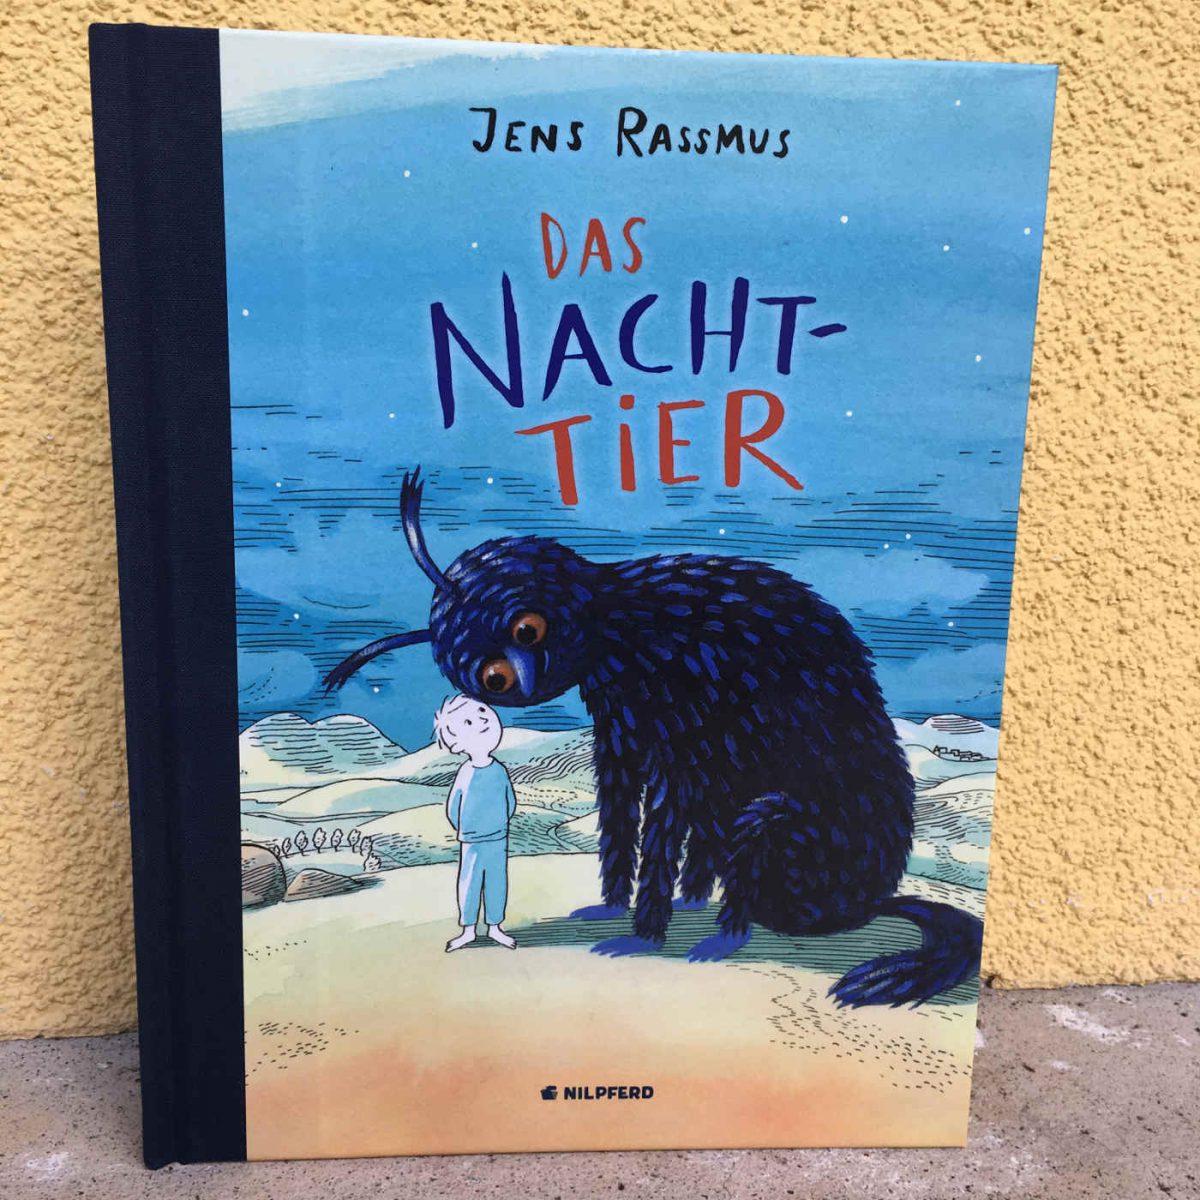 Jens Rassmus: Das Nacht-Tier